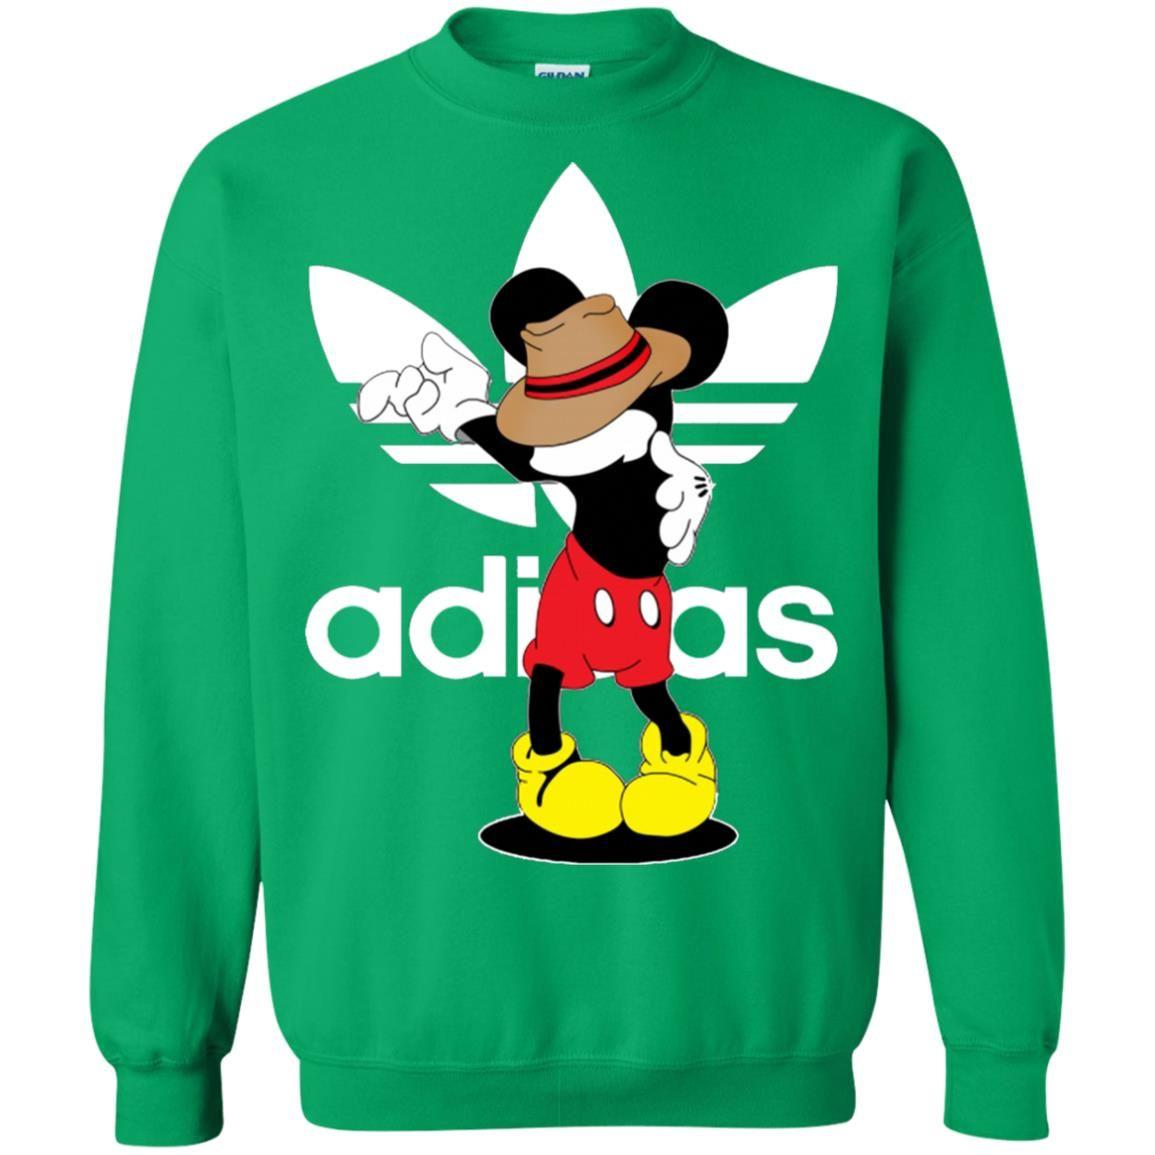 Mickey Mouse Michael Jackson Adidas Sweatshirt in 2019